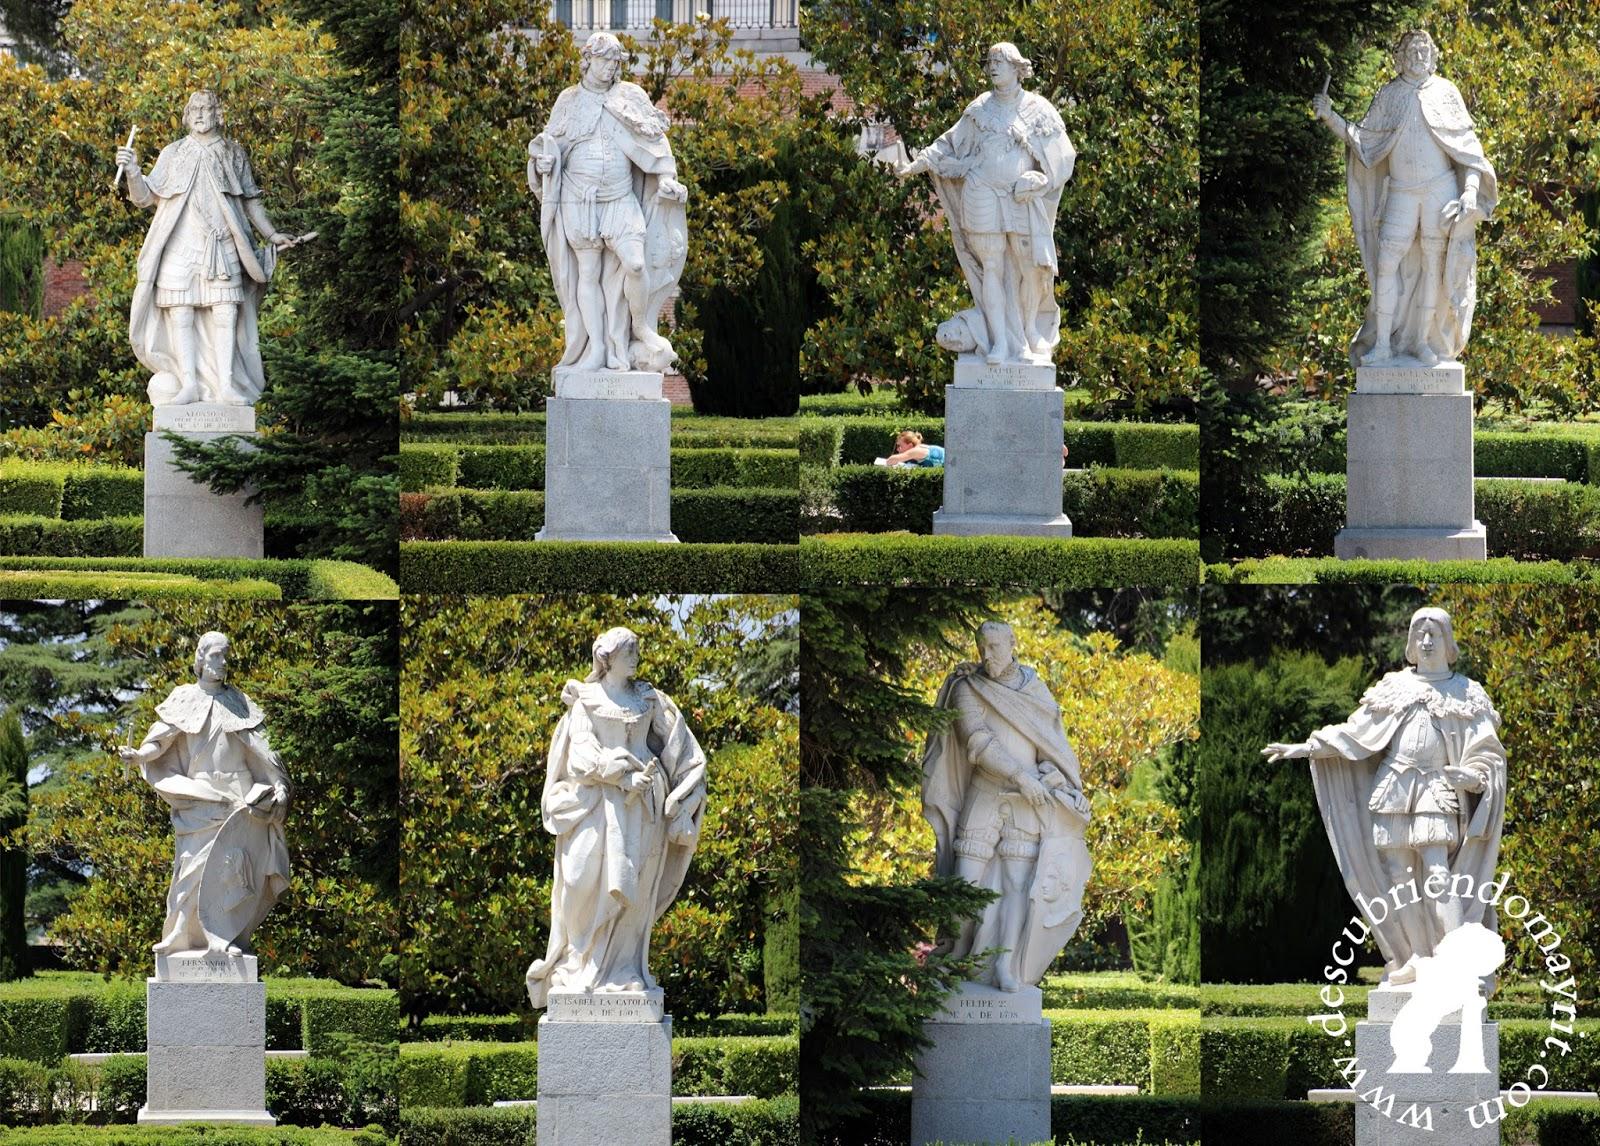 Estatuas Jardin Interesting Free Pin It With Estatuas Jardin With - Estatuas-de-jardin